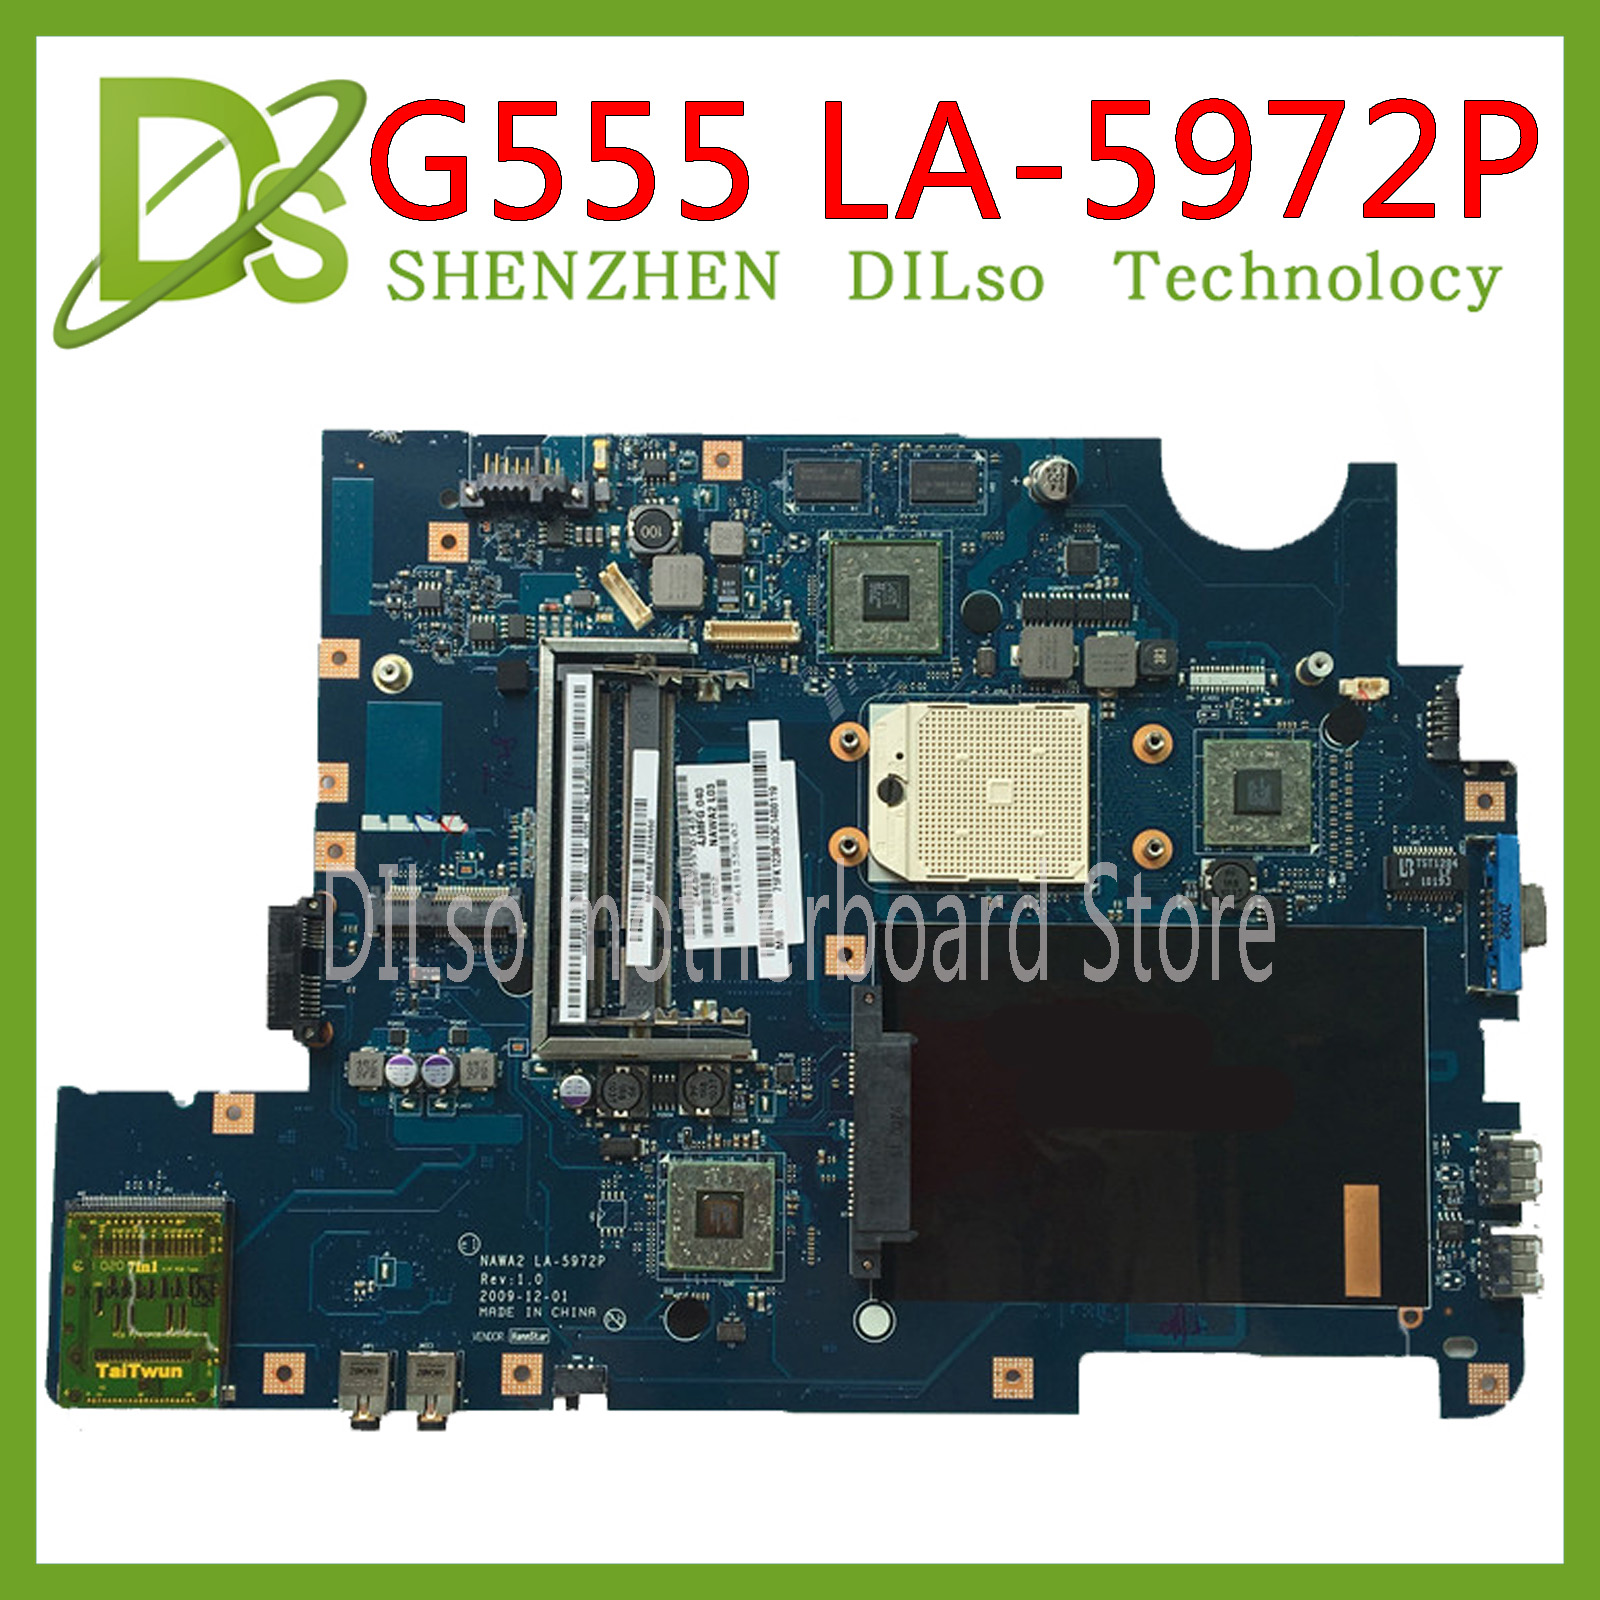 KEFU NAWA2 LA-5972P for lenovo G555 notebook G555 laptop motherboard NAWA2 LA-5972P mainboard with GPU Test original mothebroard